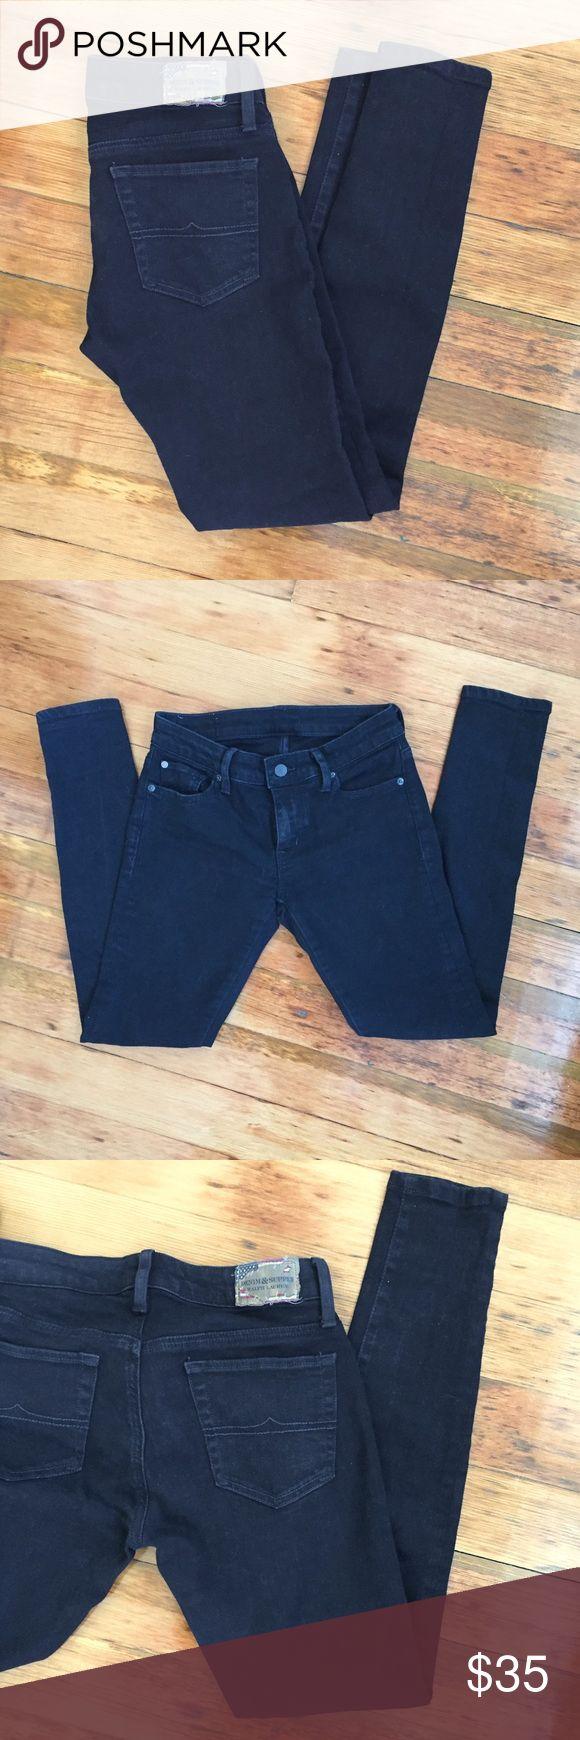 Ralph Lauren Jeans Demin & Supply black skinny jeans by Ralph Lauren. Only worn once! Size 25/30! Denim & Supply Ralph Lauren Jeans Skinny